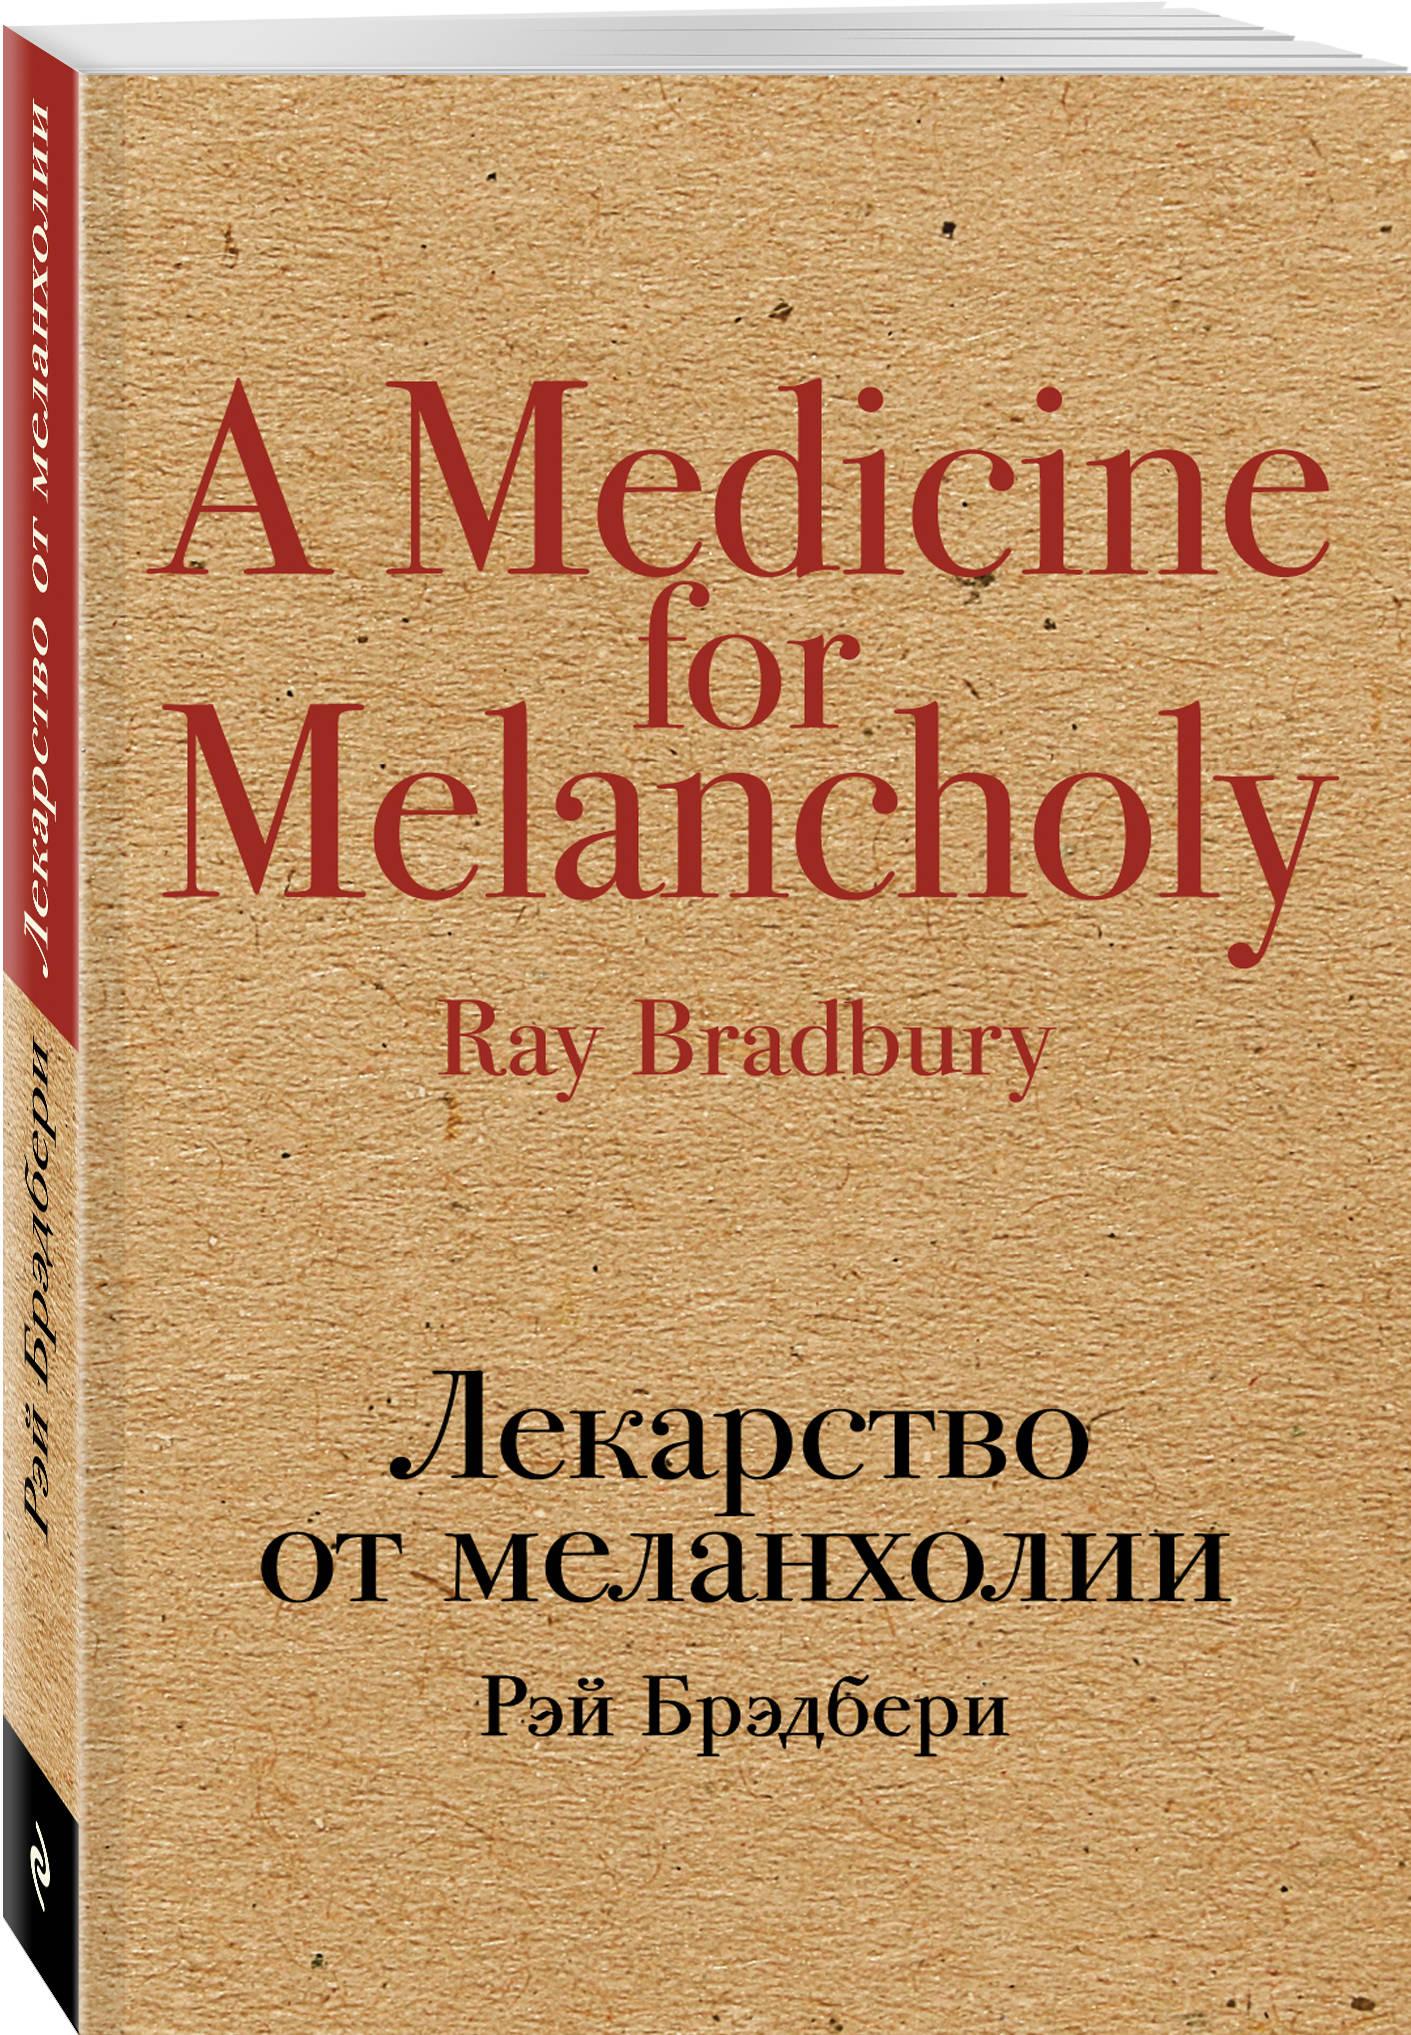 Рэй Брэдбери Лекарство от меланхолии брэдбери рэй лекарство от меланхолии isbn 978 5 04 089409 3